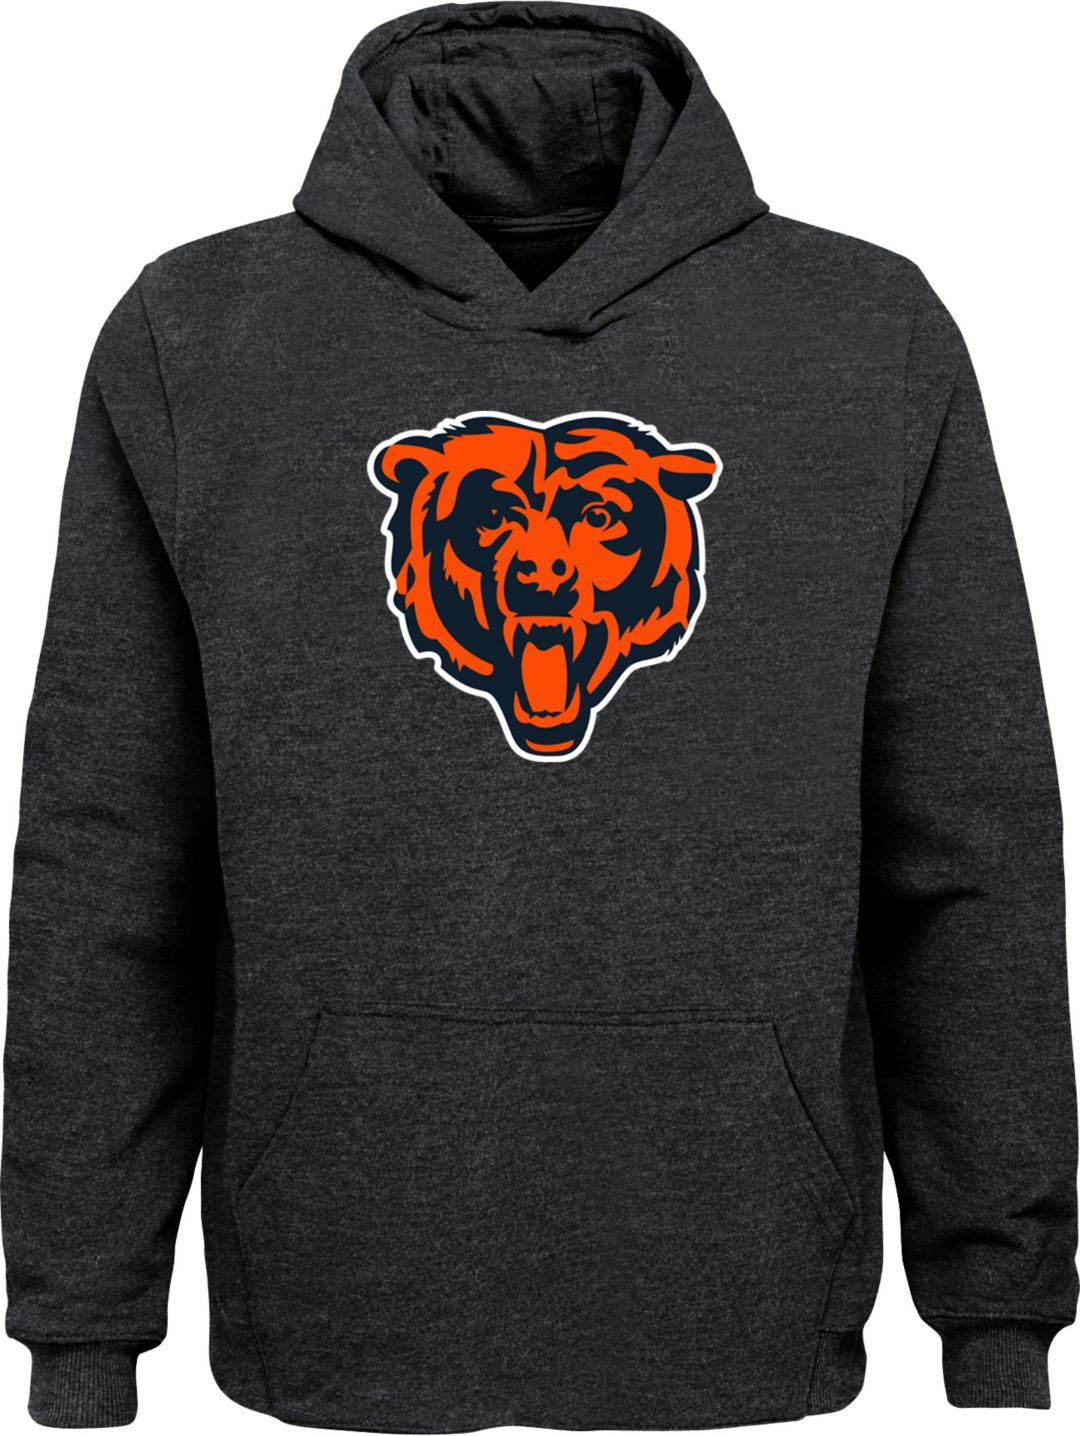 buy popular ce2ff fc959 NFL Team Apparel Youth Chicago Bears Logo Grey Hoodie